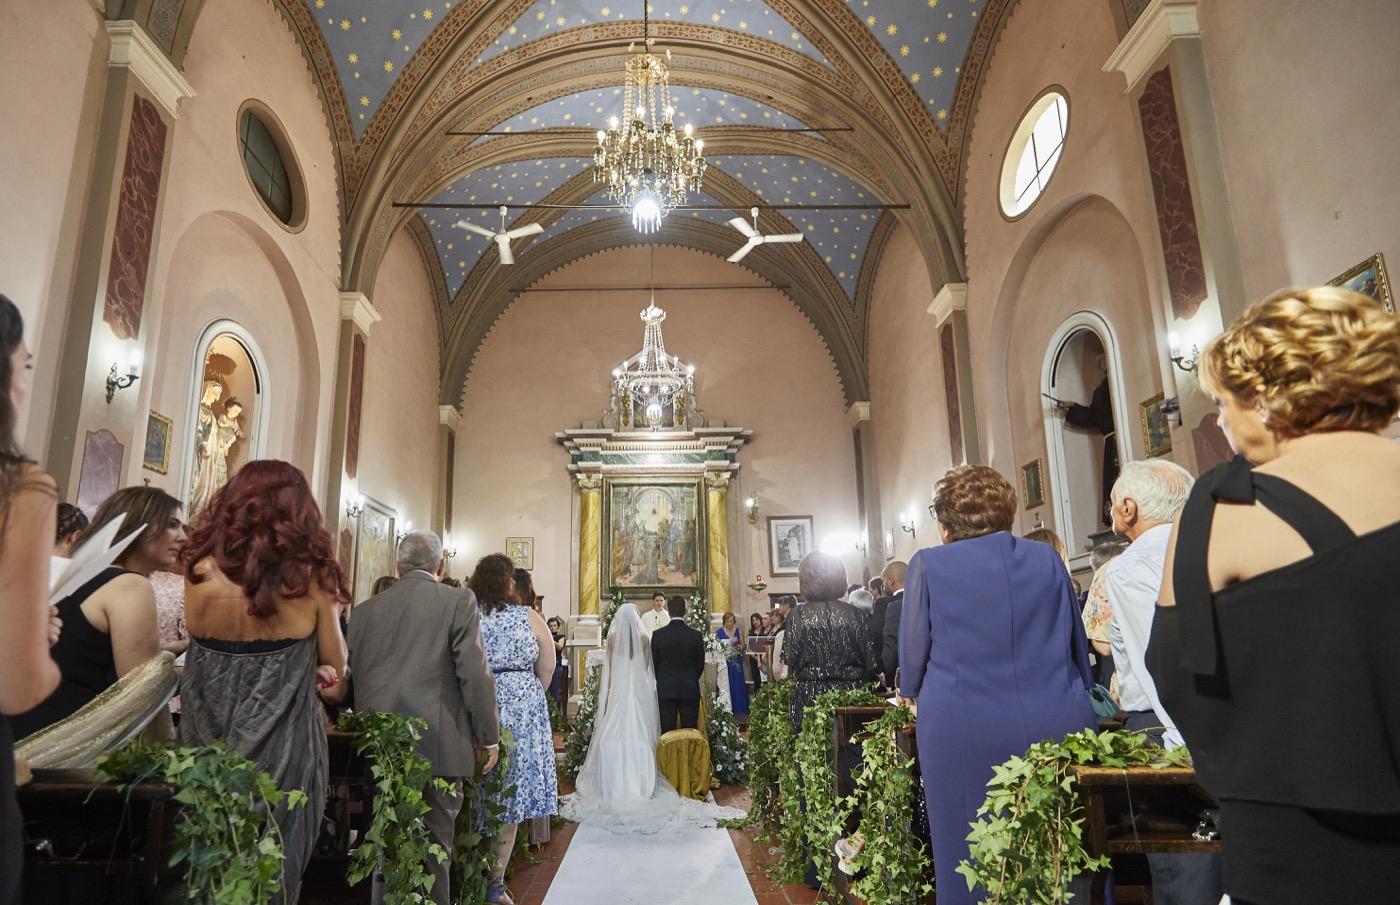 Claudio-Coppola-wedding-photographer-abbazia-7-frati-piegaro-46